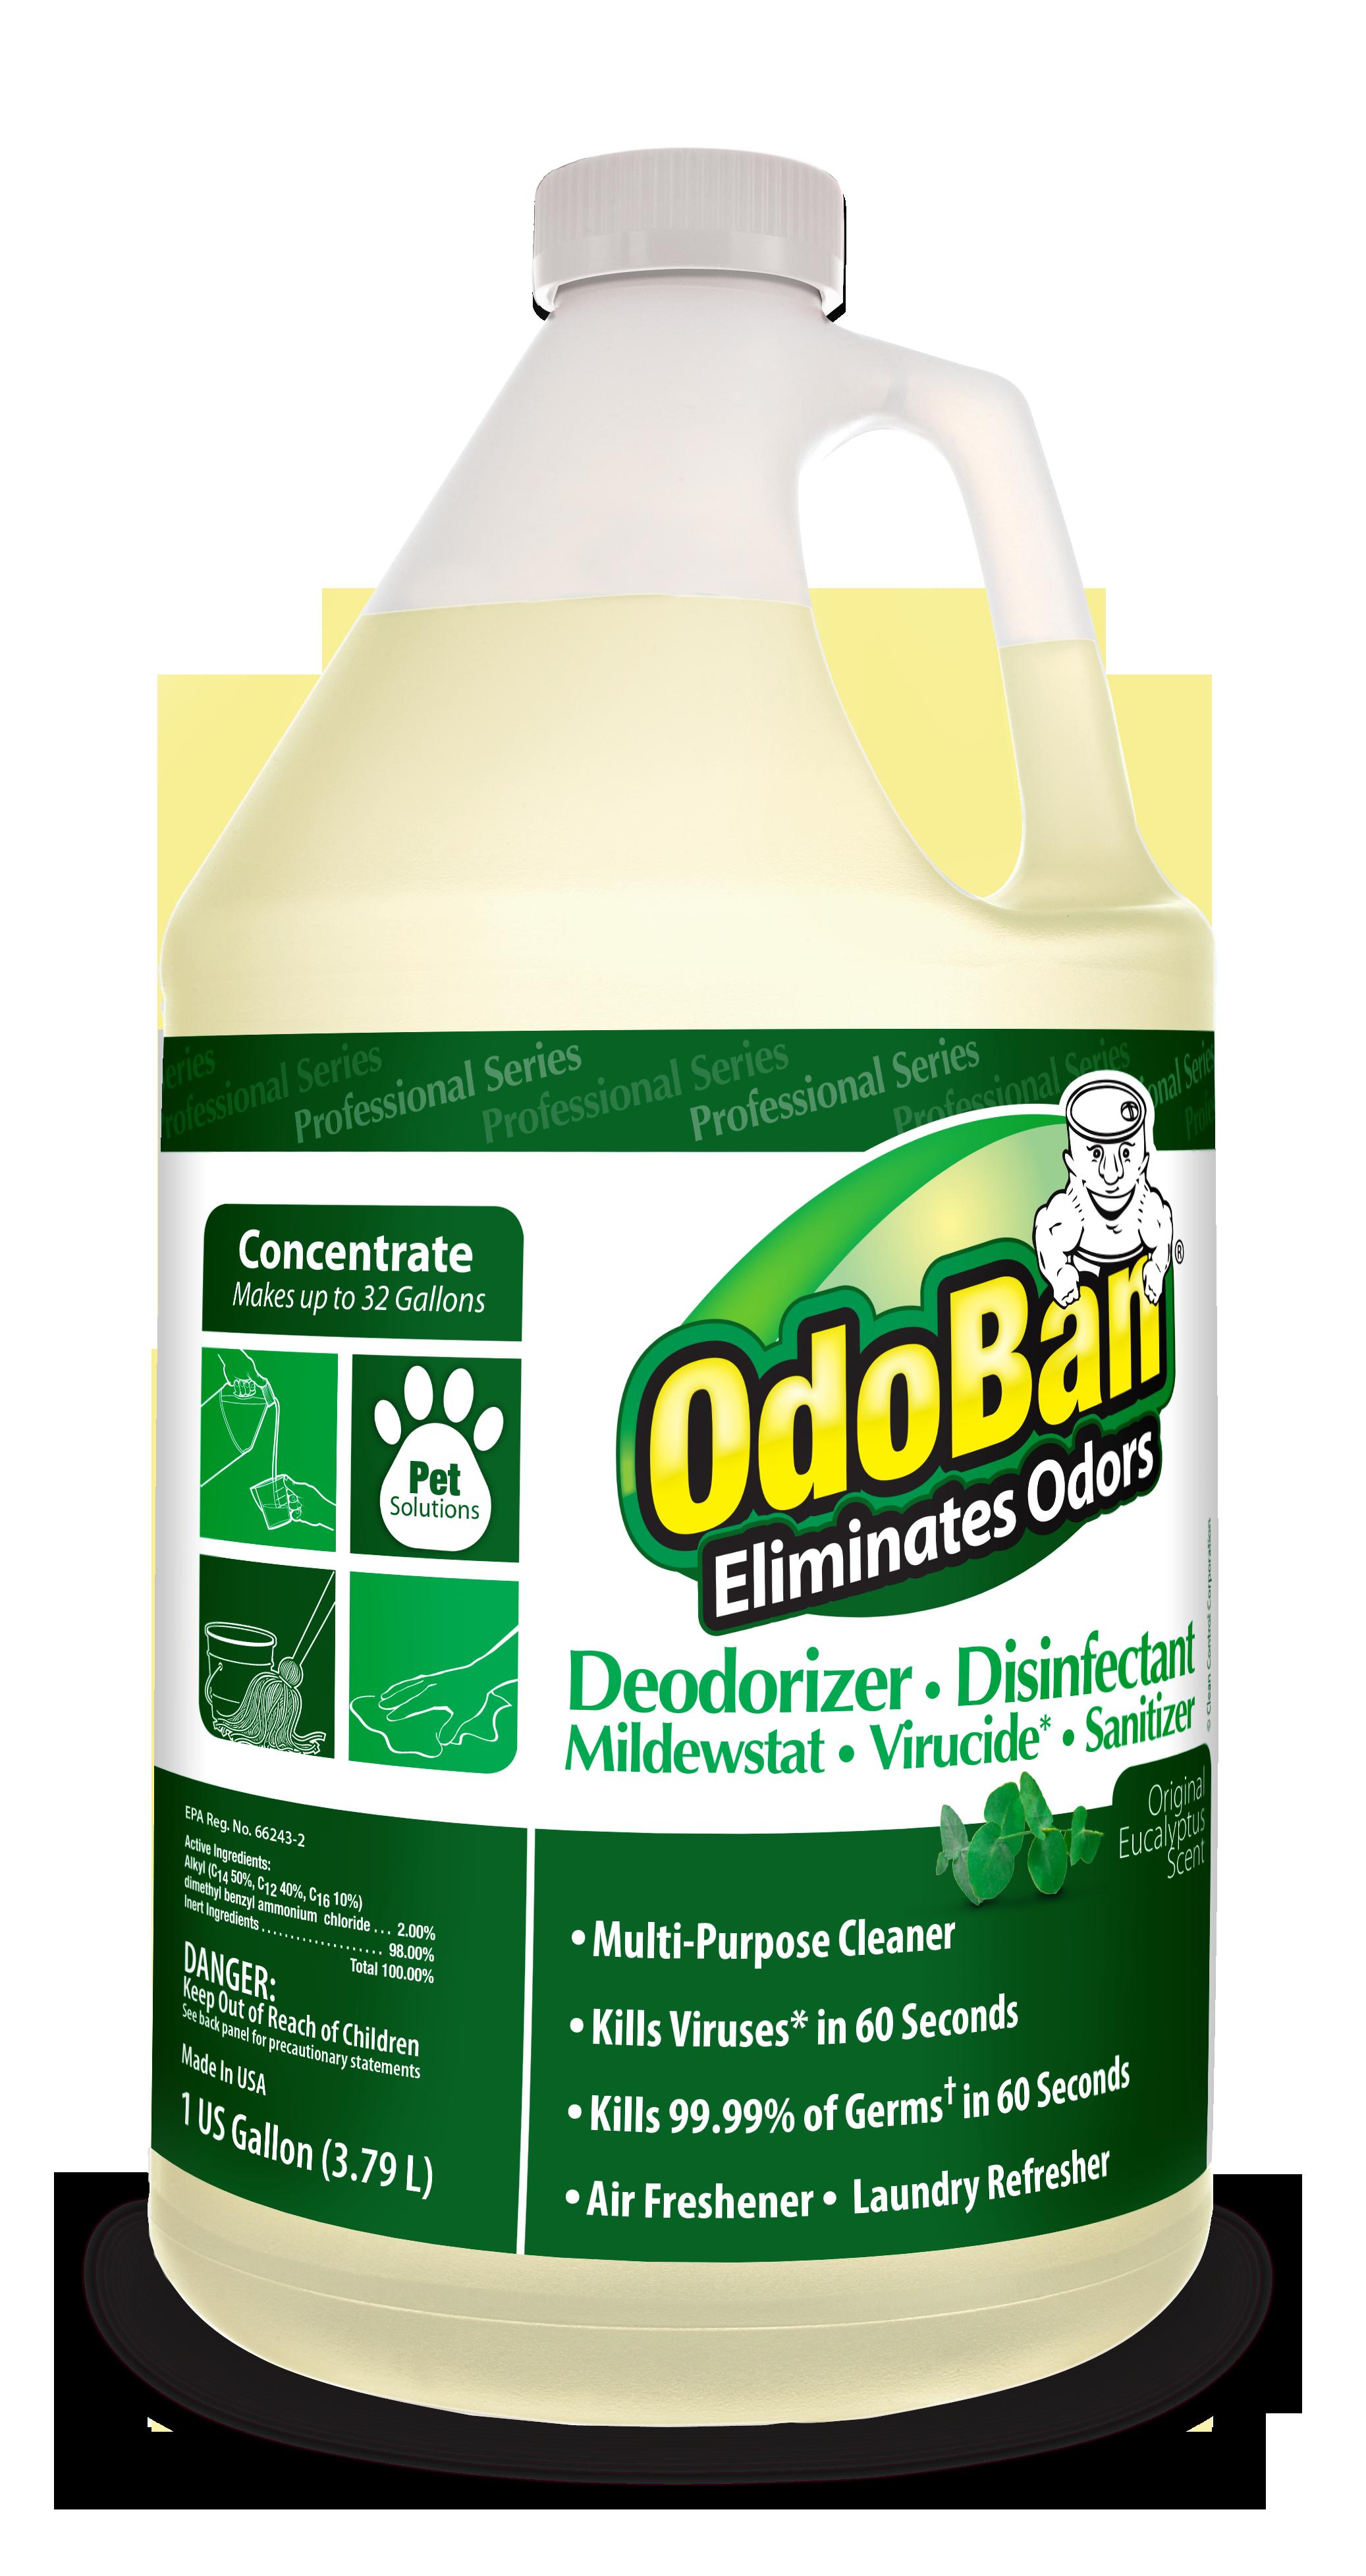 Original Eucalyptus Scent Multi Purpose Cleaner Kill Viruses In 60 Seconds Kills 99 99 Of Germ Odor Eliminator Pet Odor Eliminator Multipurpose Cleaner